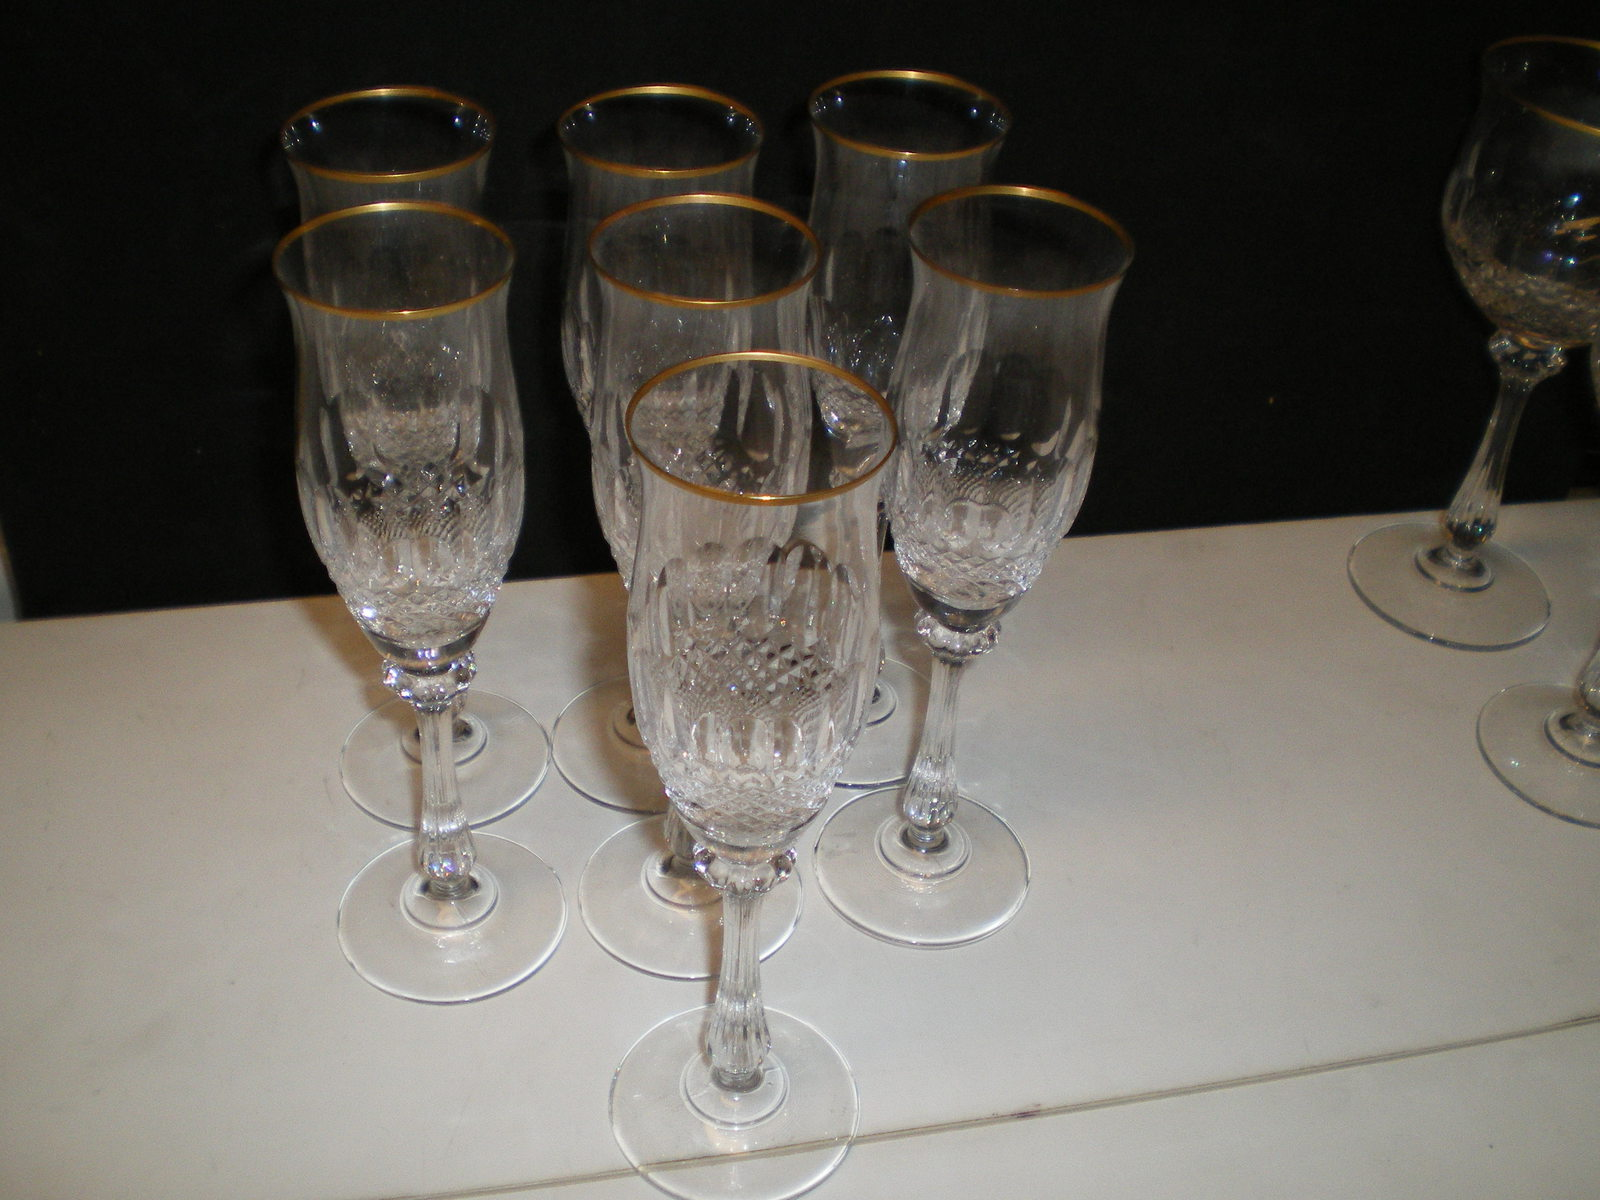 20 PIECE SET MIKASA GOLD CROWN CRYSTAL GLASSWARE~~RARE SET